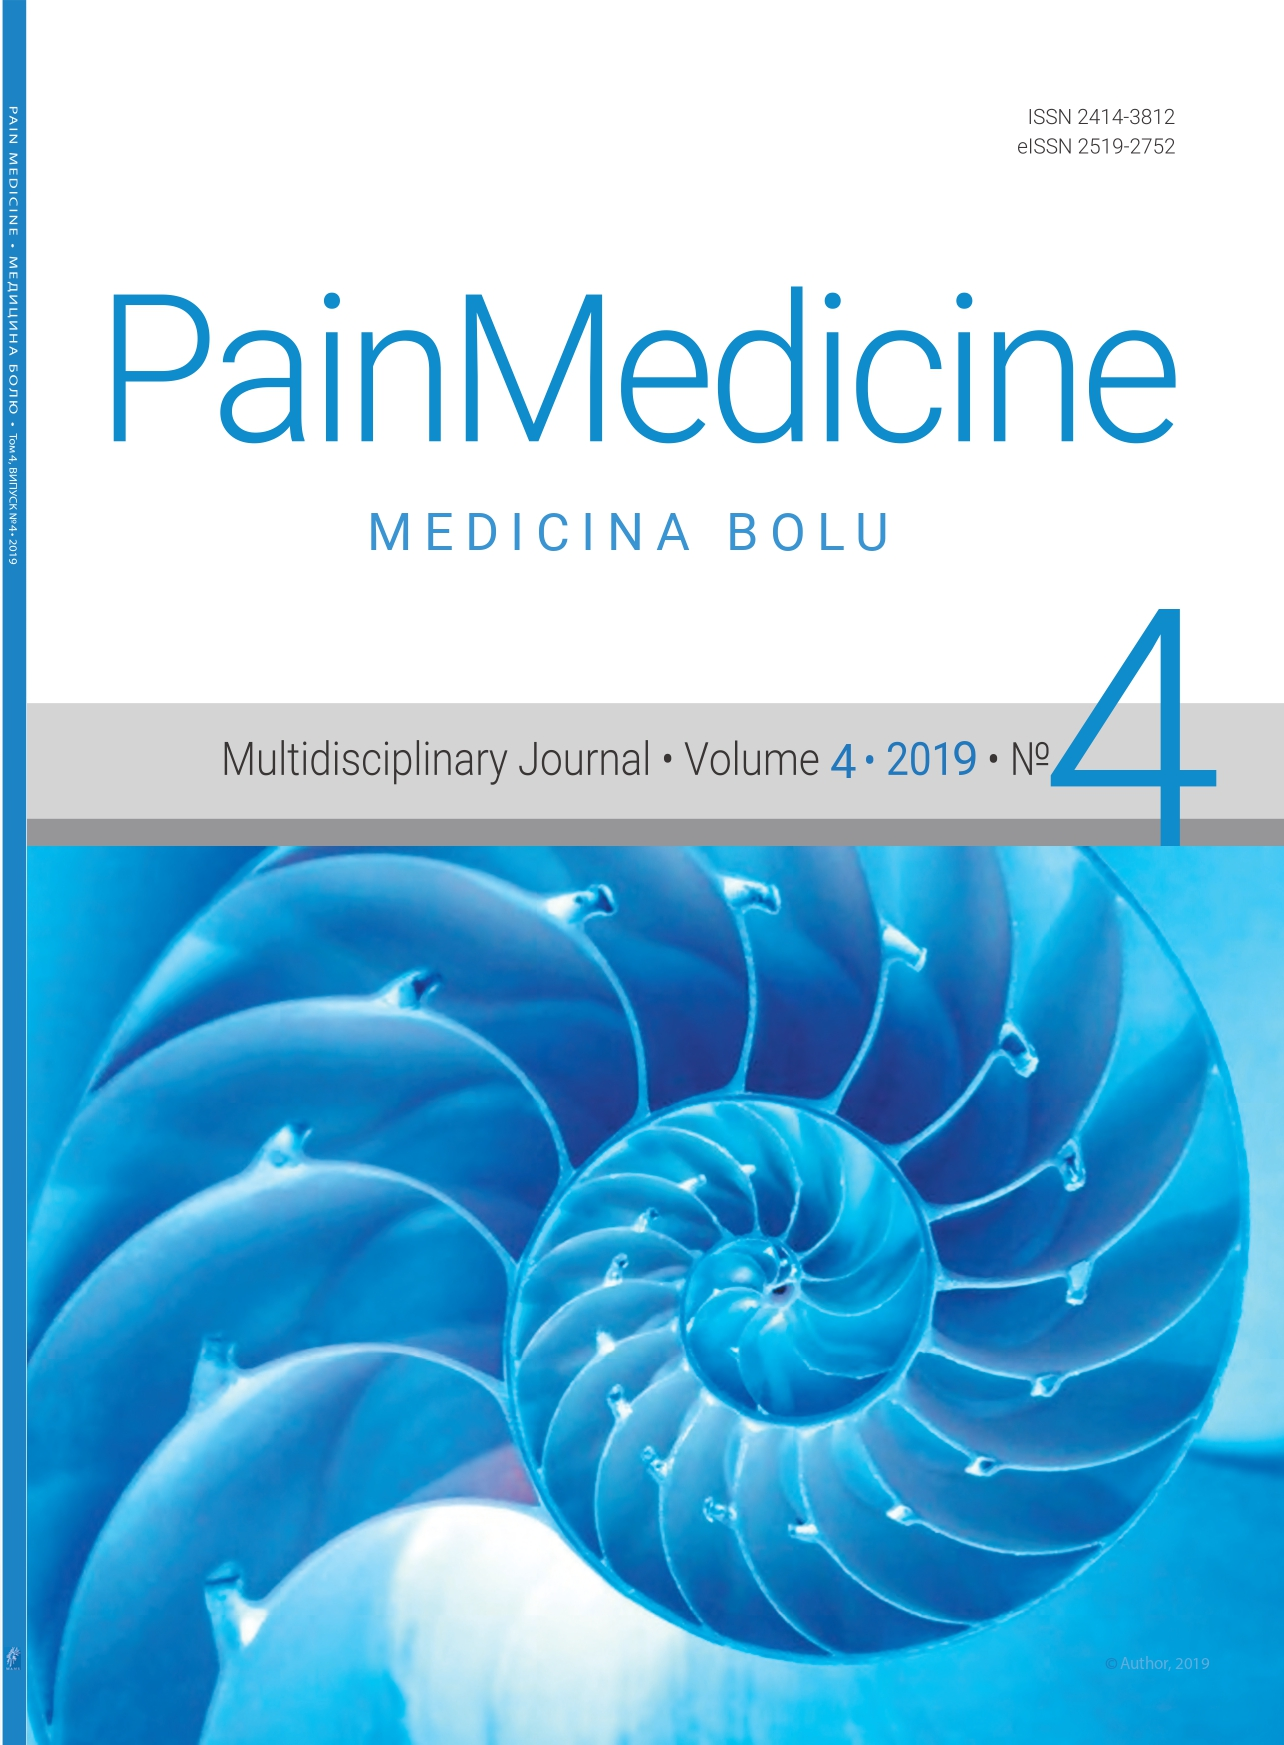 Pain medicine #4 2019